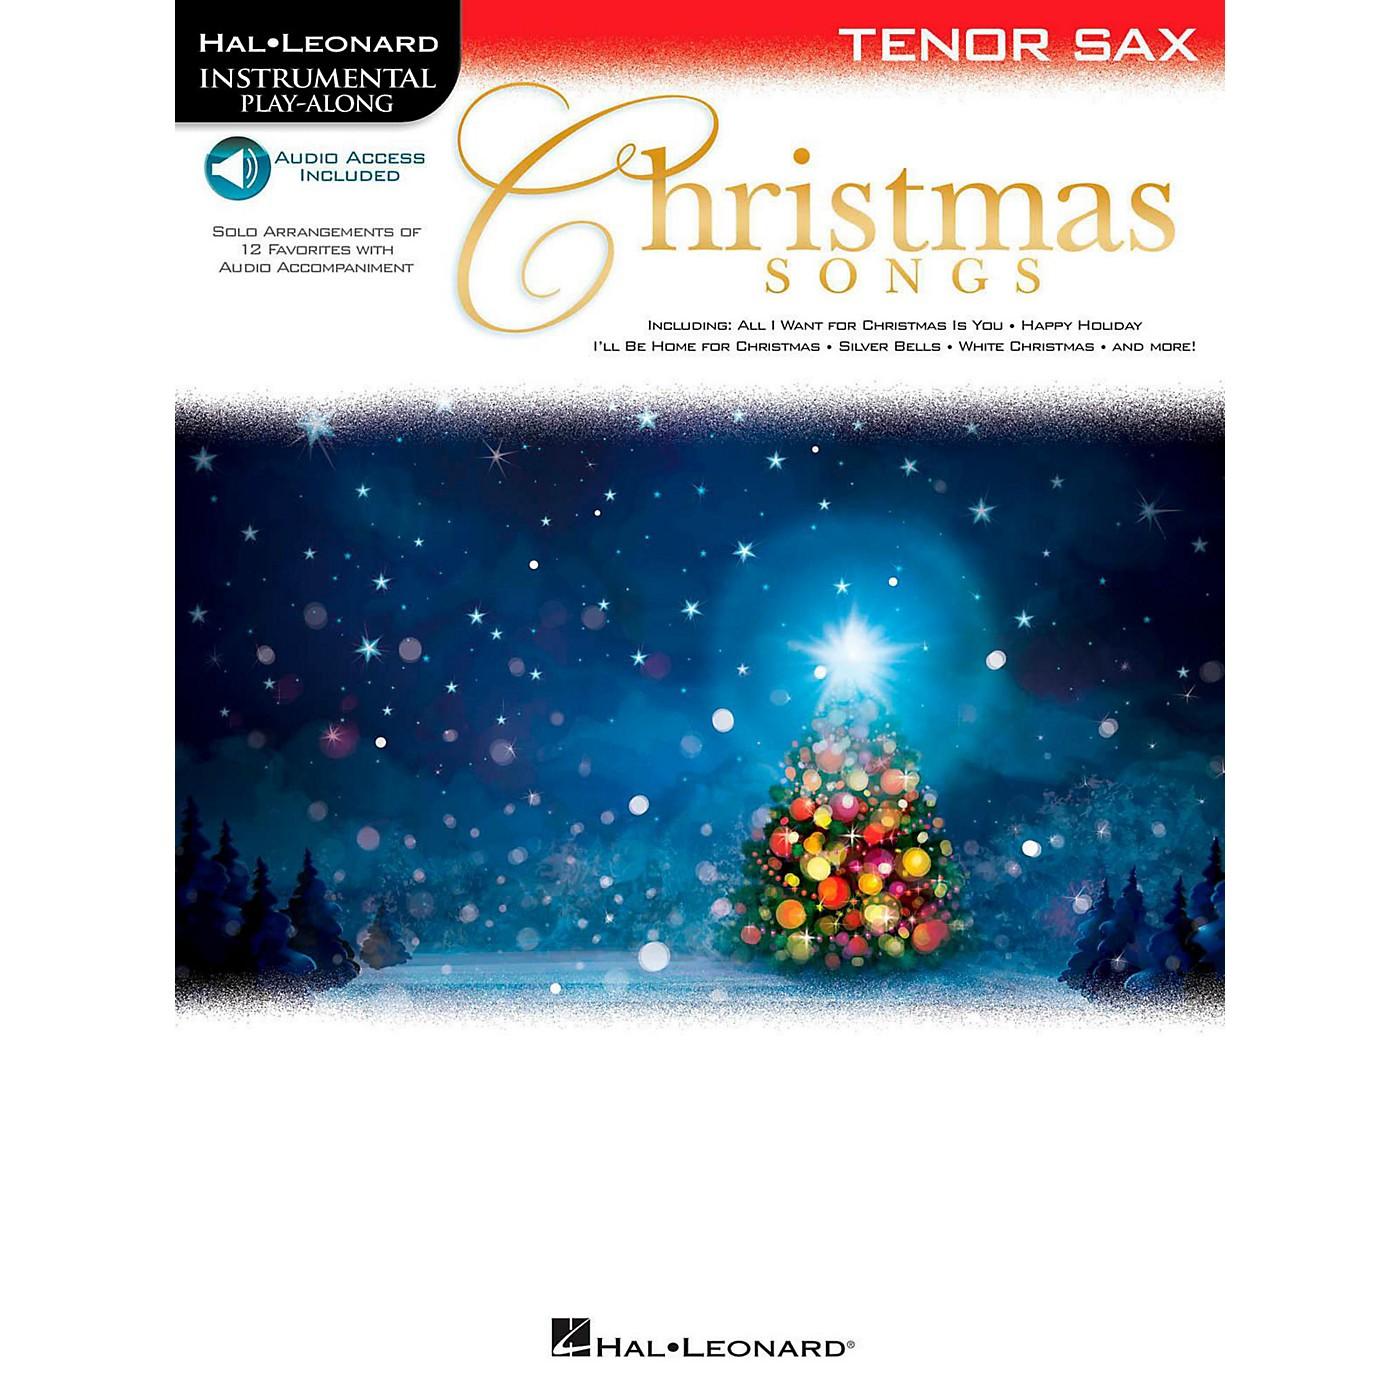 Hal Leonard Christmas Songs For Tenor Sax - Instrumental Play-Along (Book/Audio On-Line) thumbnail